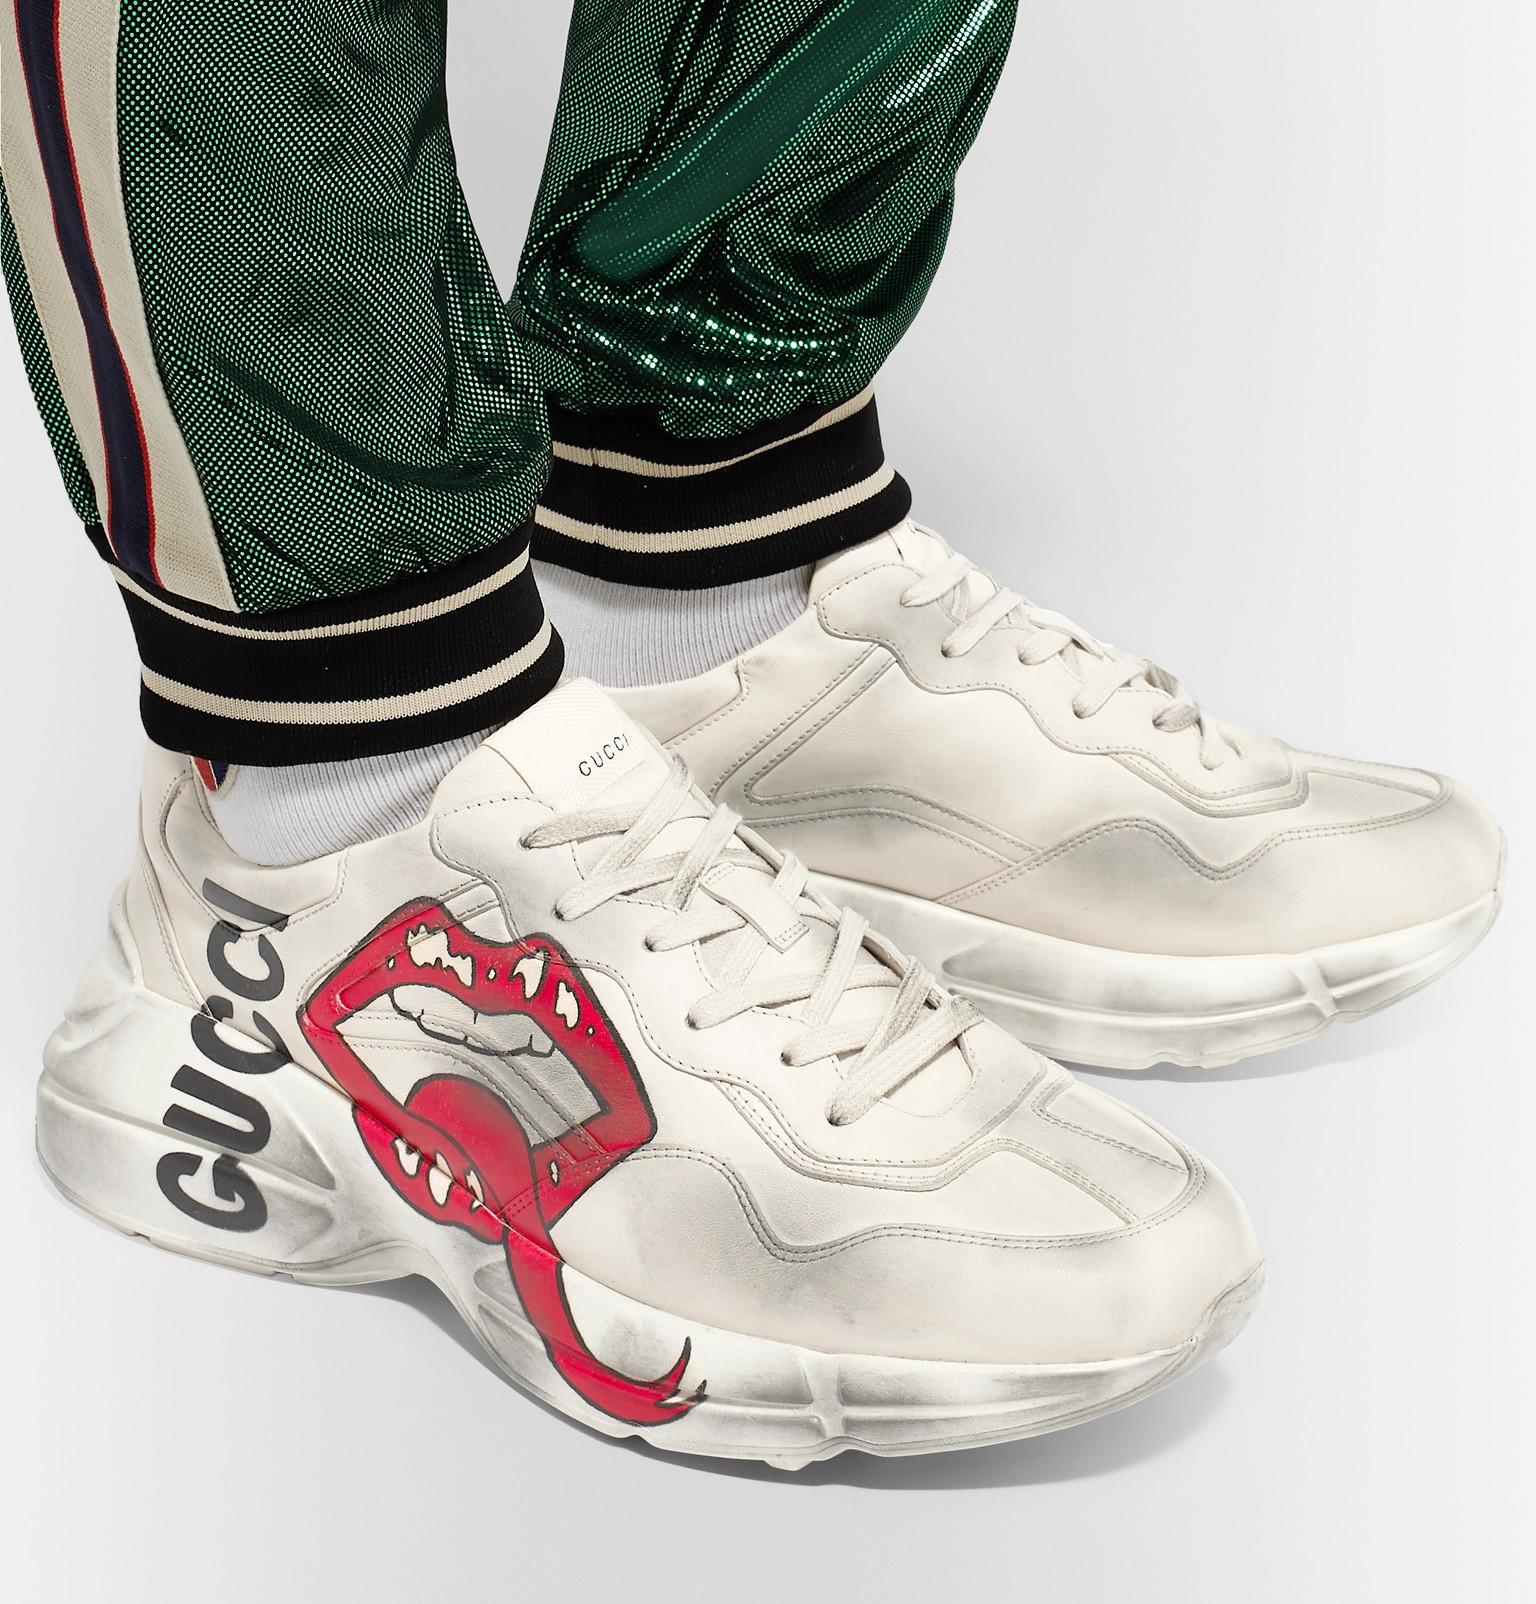 c7b625b6b0c Gucci - Rhyton Printed Distressed Leather Sneakers